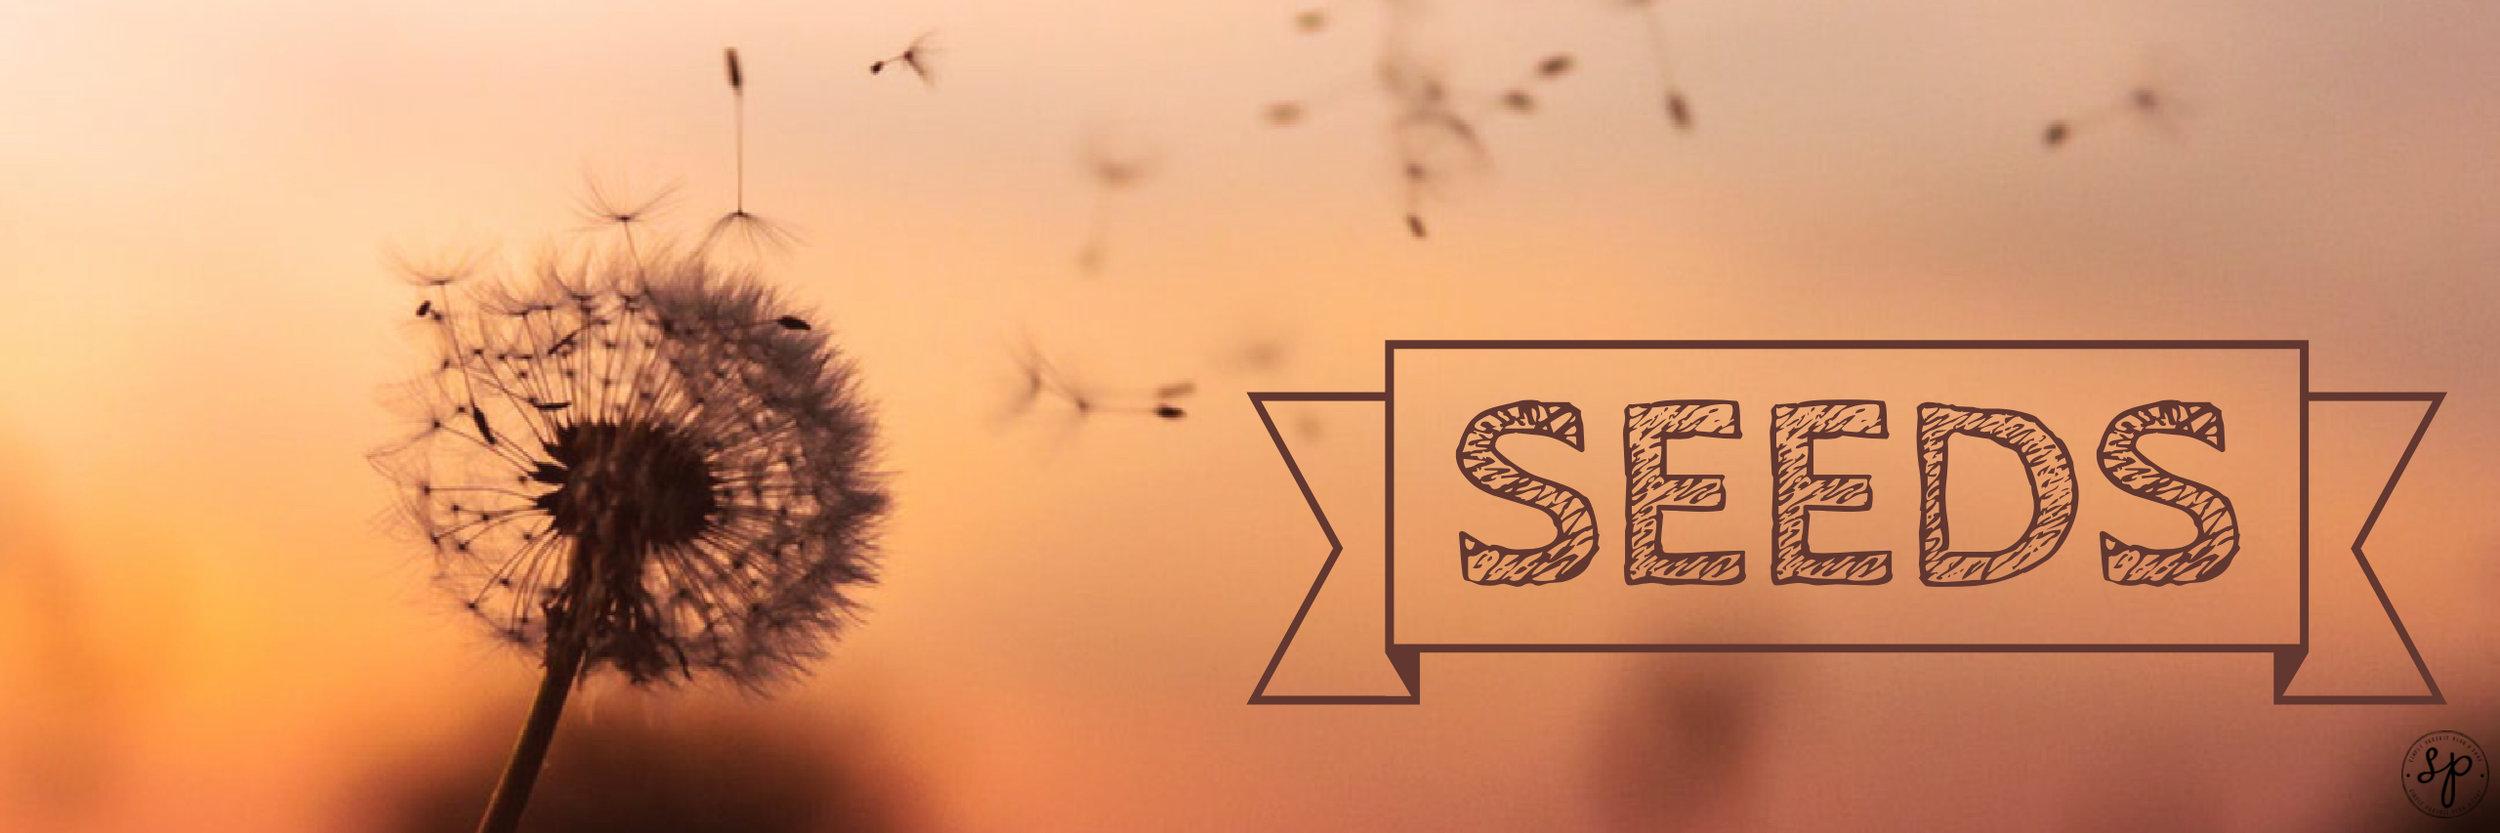 Adobe Spark-28.jpg